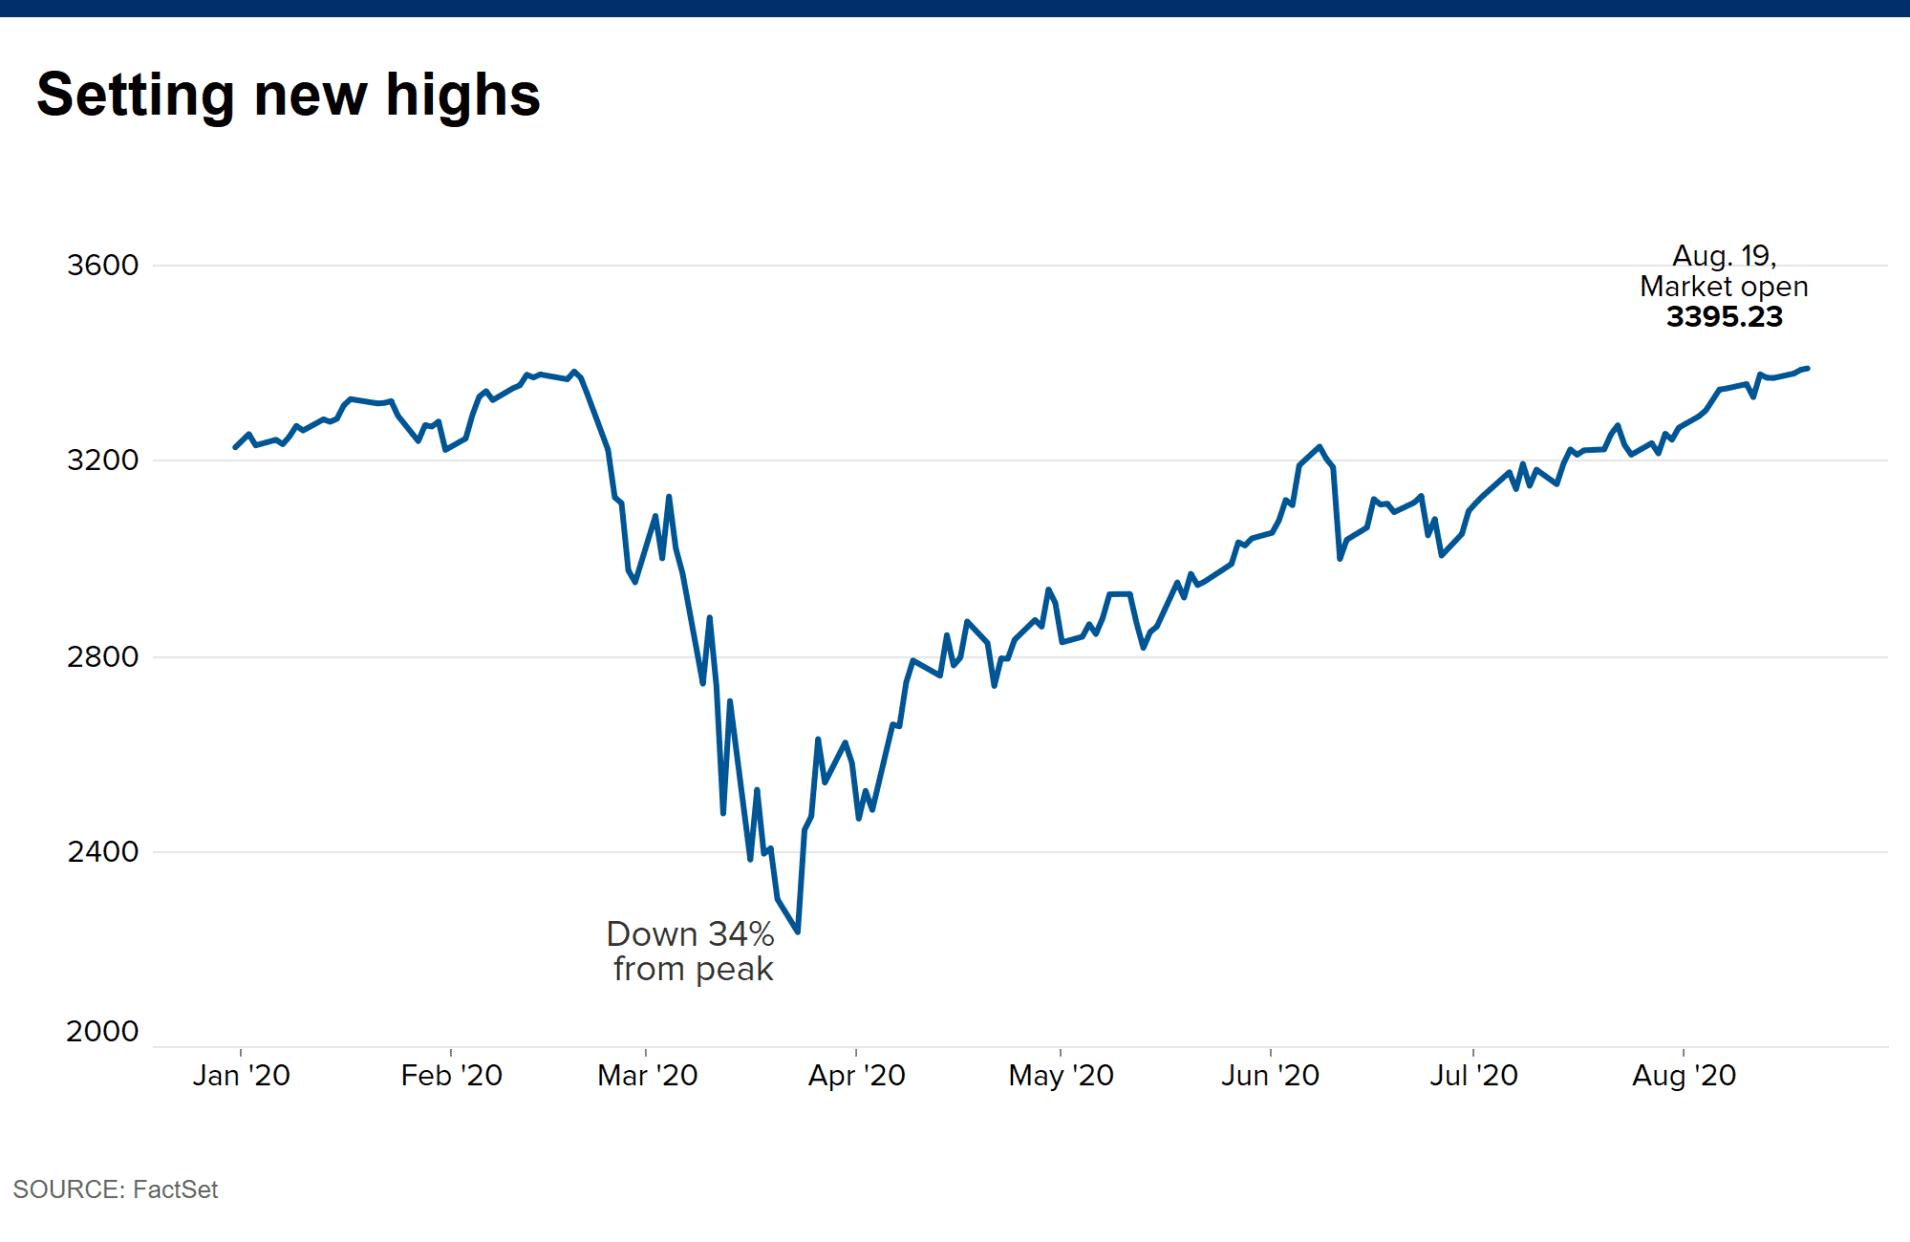 Stock Market Volatility in 2020